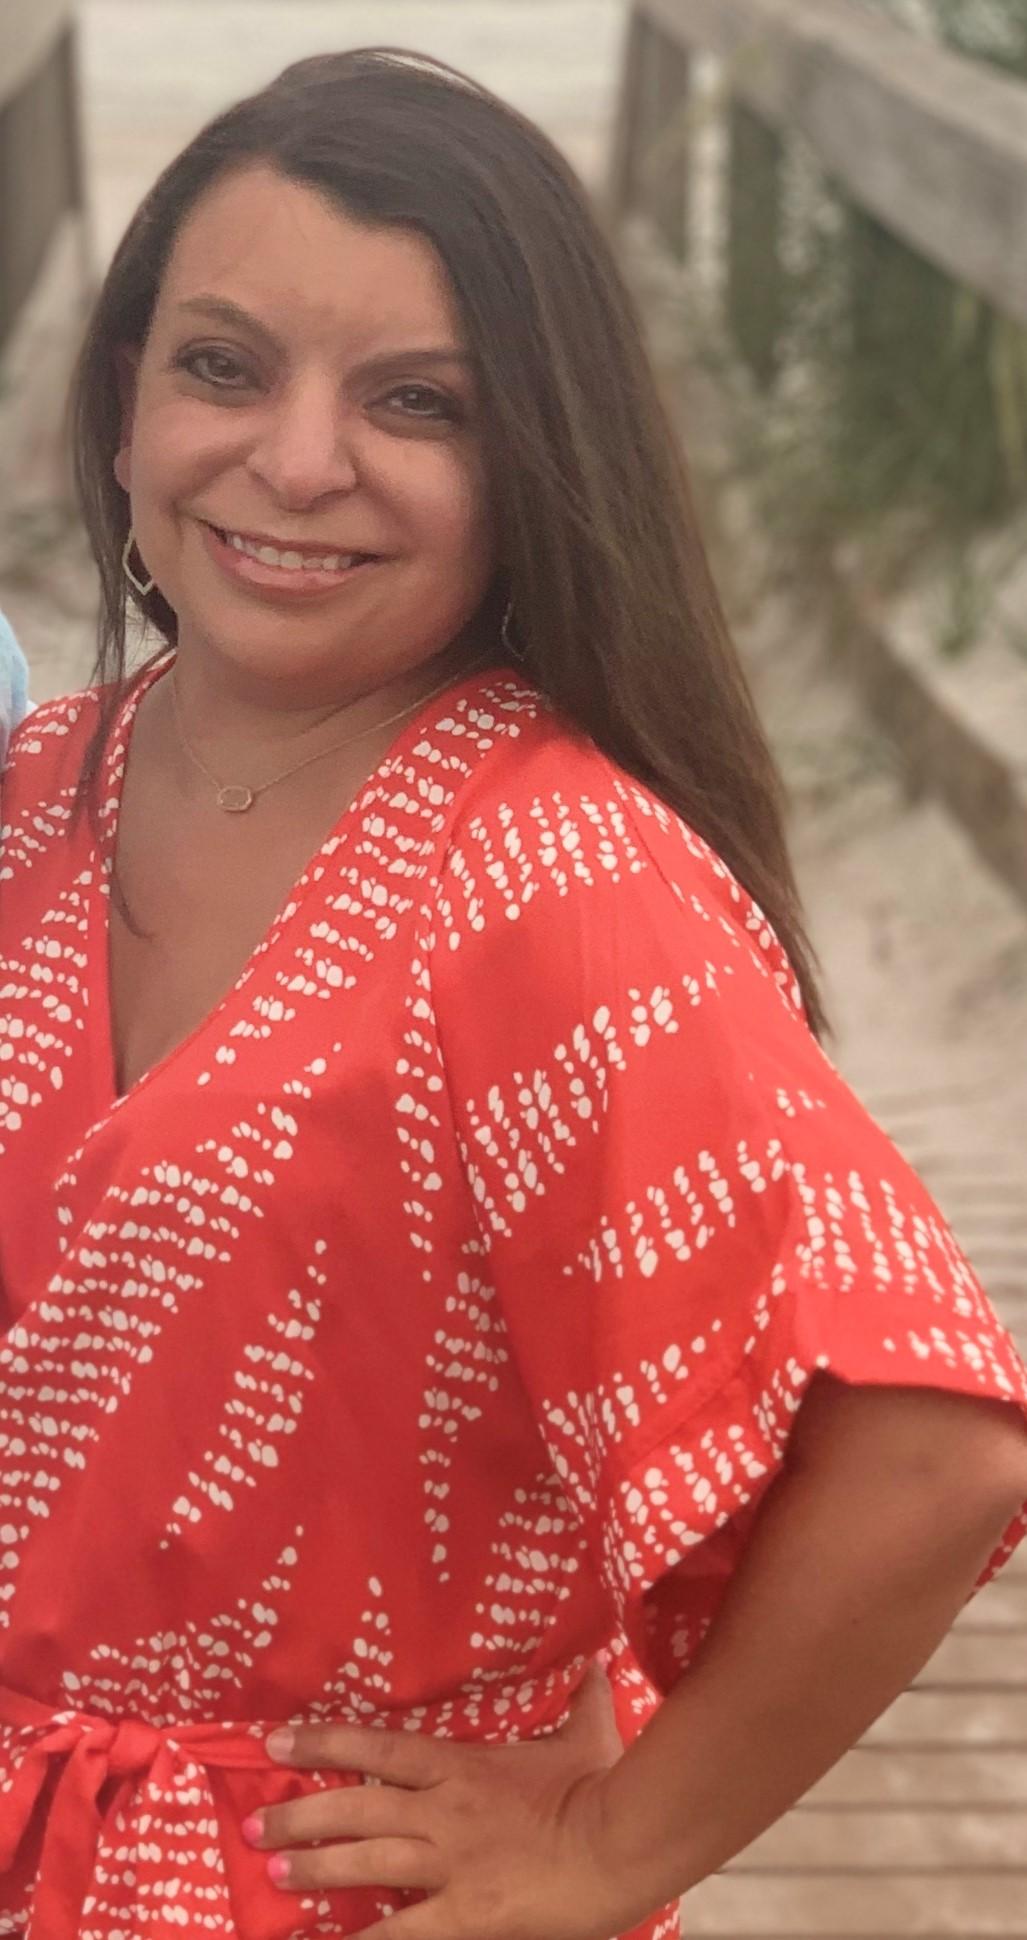 Hi! I'm Ms. Cawthon